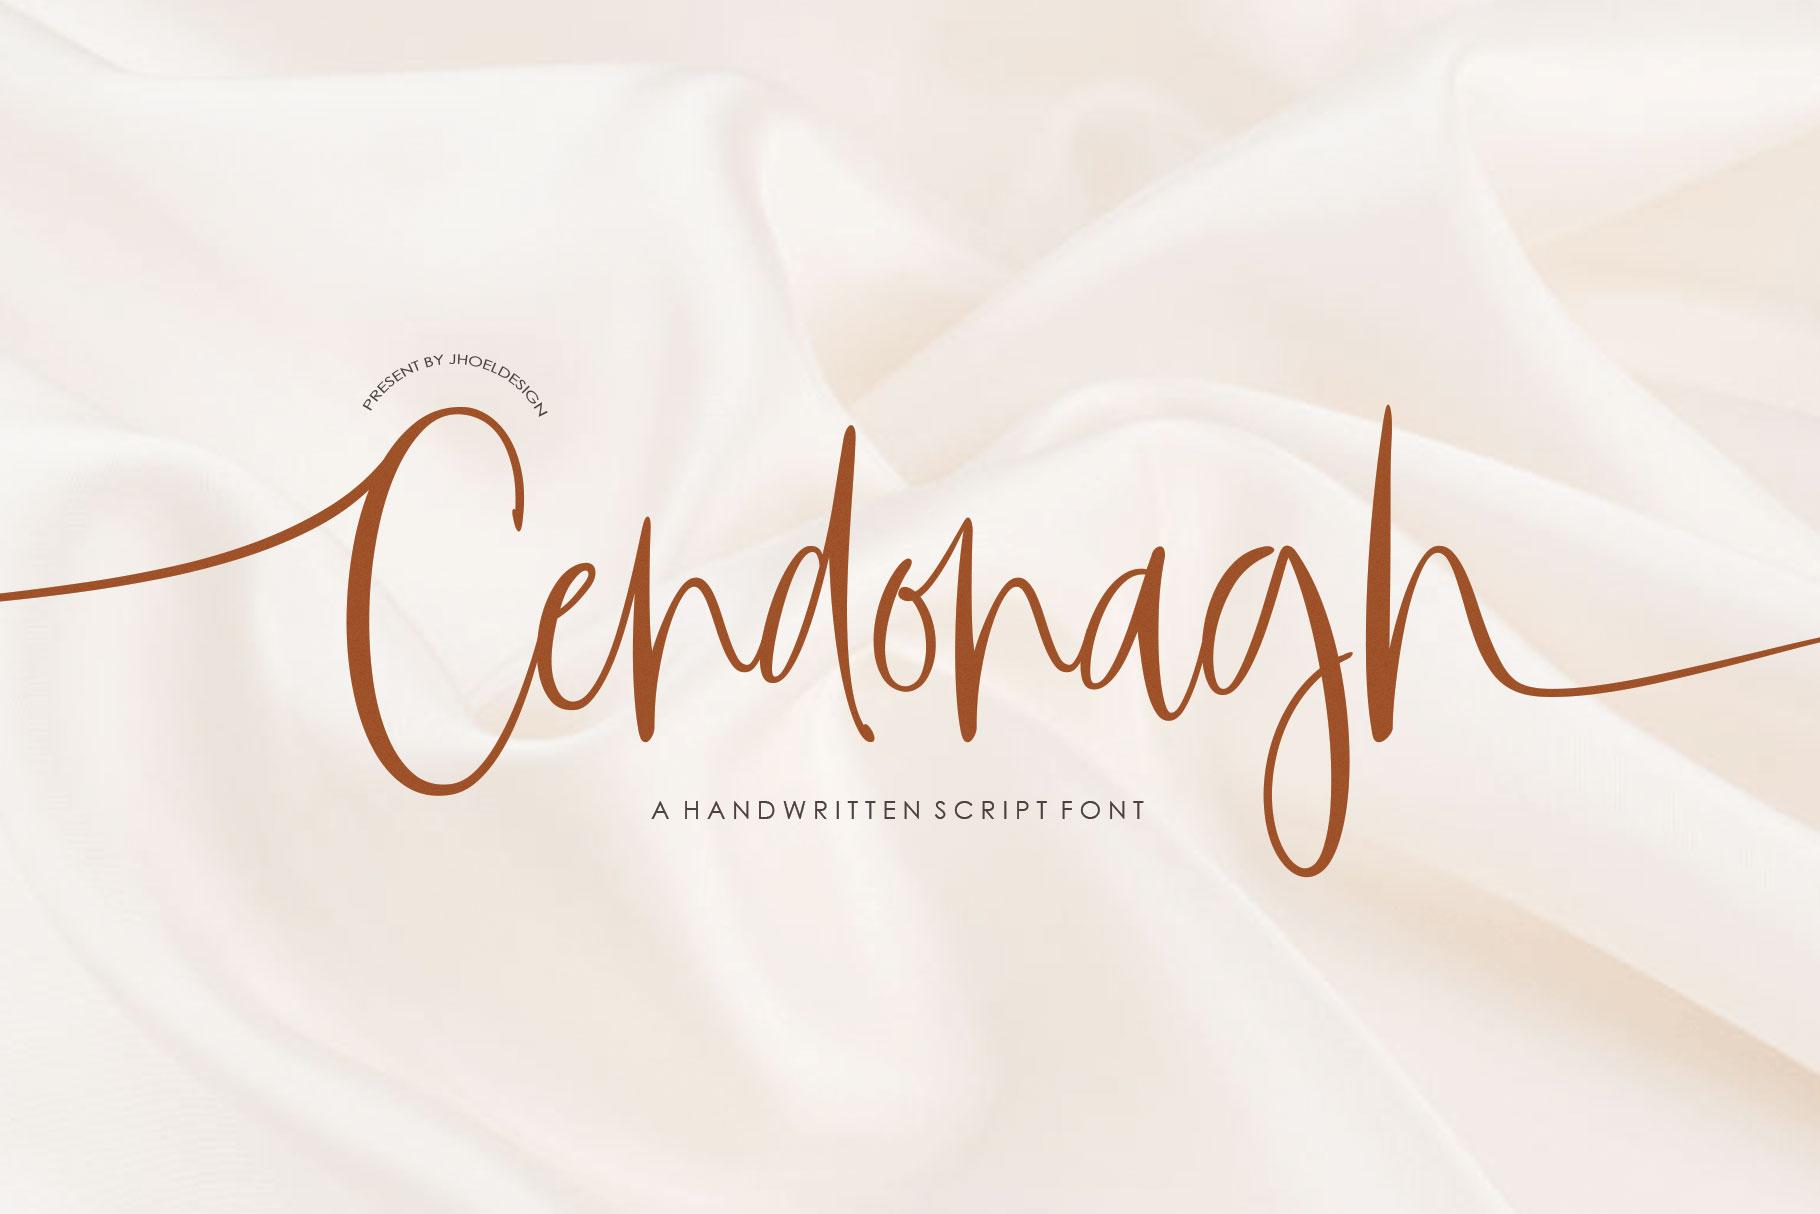 Cendonagh example image 1